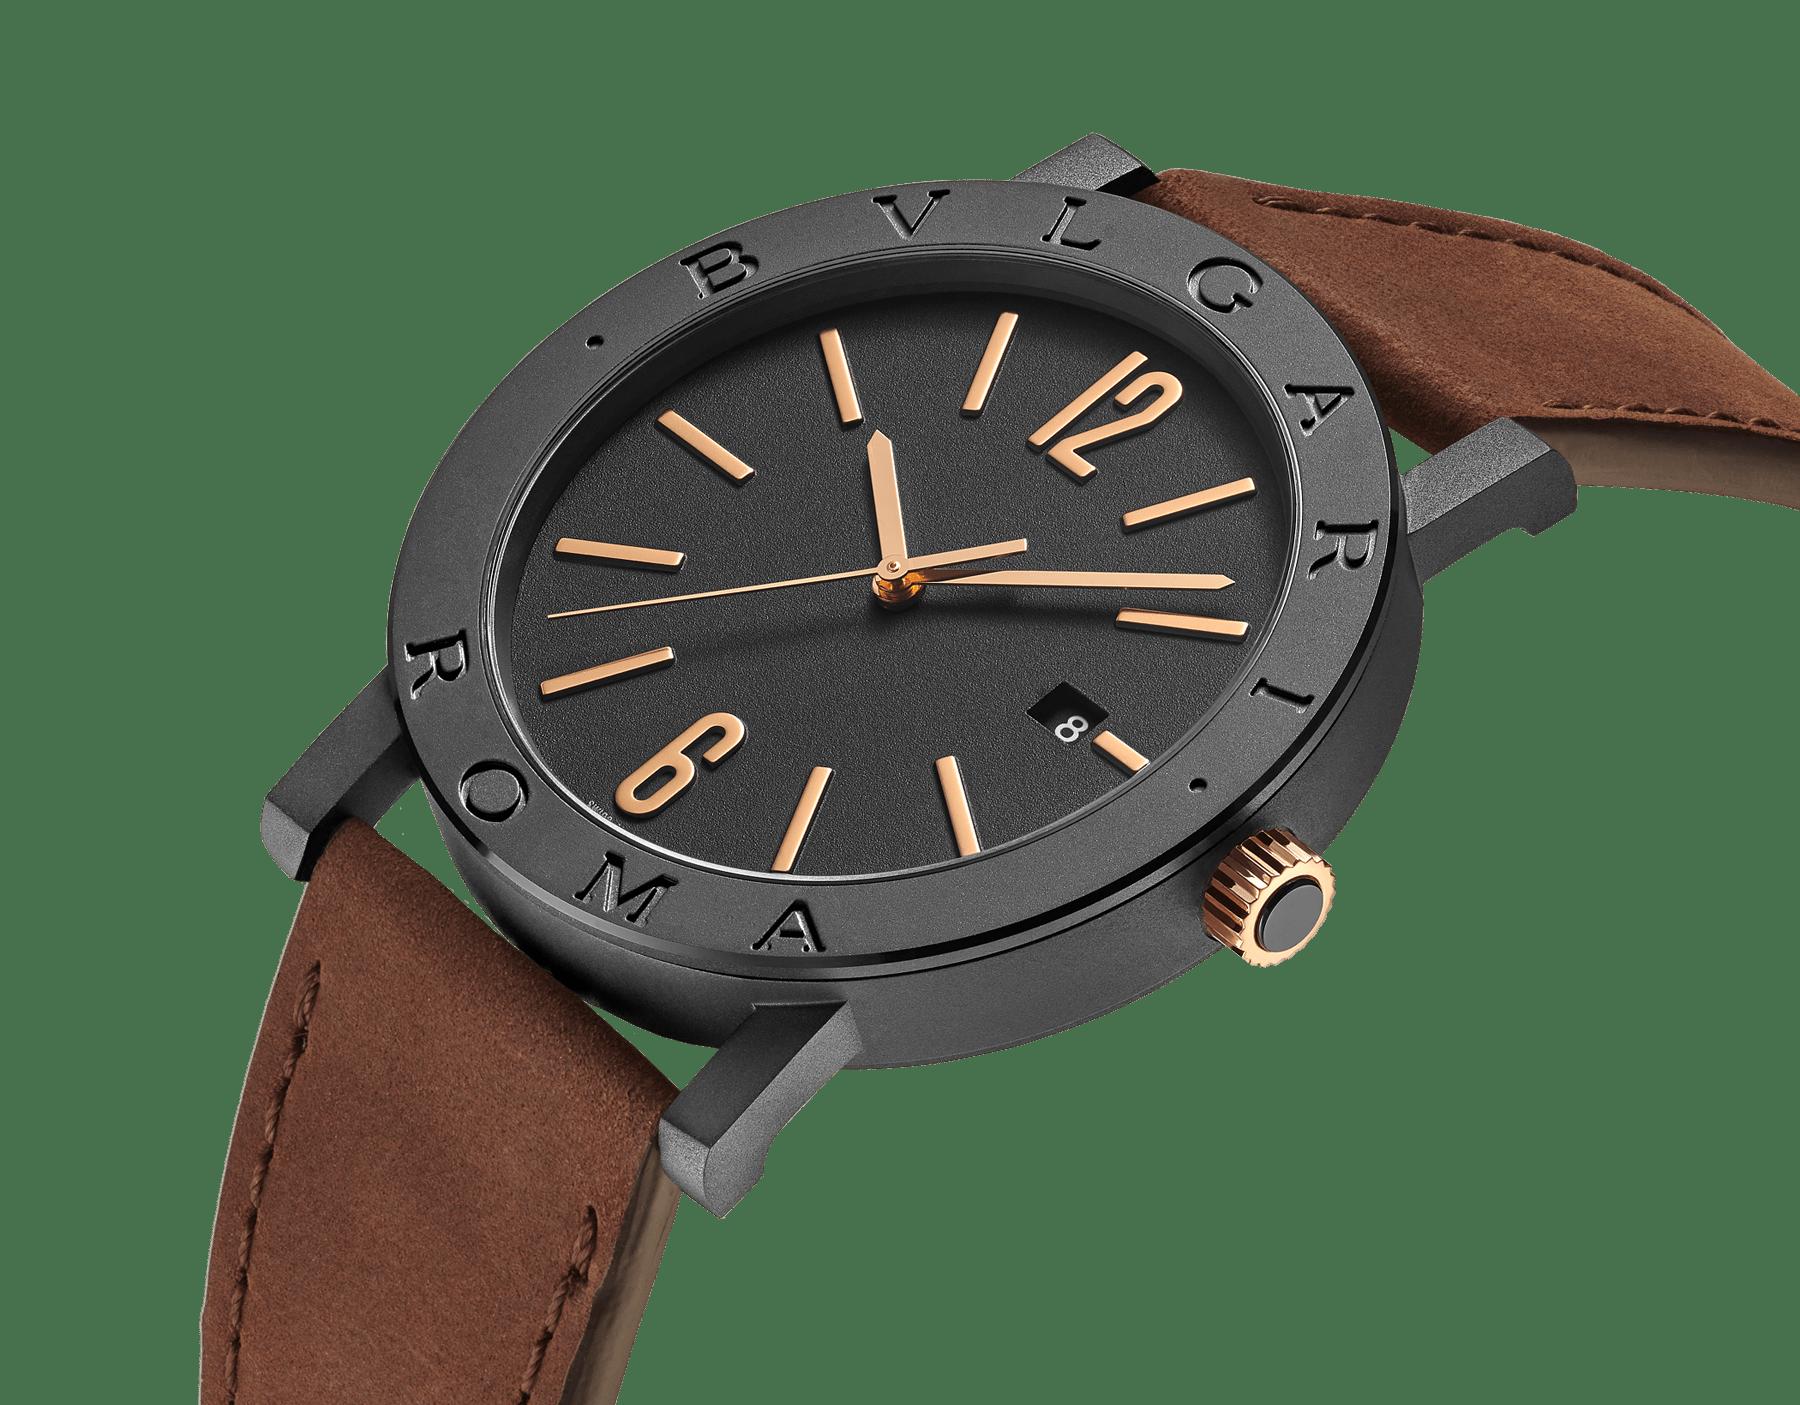 BVLGARI BVLGARI 城市特別版「羅馬」腕錶,搭載機械機芯,自動上鍊。精鋼錶殼,黑色 DLC 類鑽碳高耐磨鍍膜。錶圈鐫刻 BVLGARI ROMA 字樣,透明底蓋。黑色漆面錶盤,玫瑰金時標。棕色小牛皮錶帶,可換式黑色橡膠錶帶。 103219 image 4